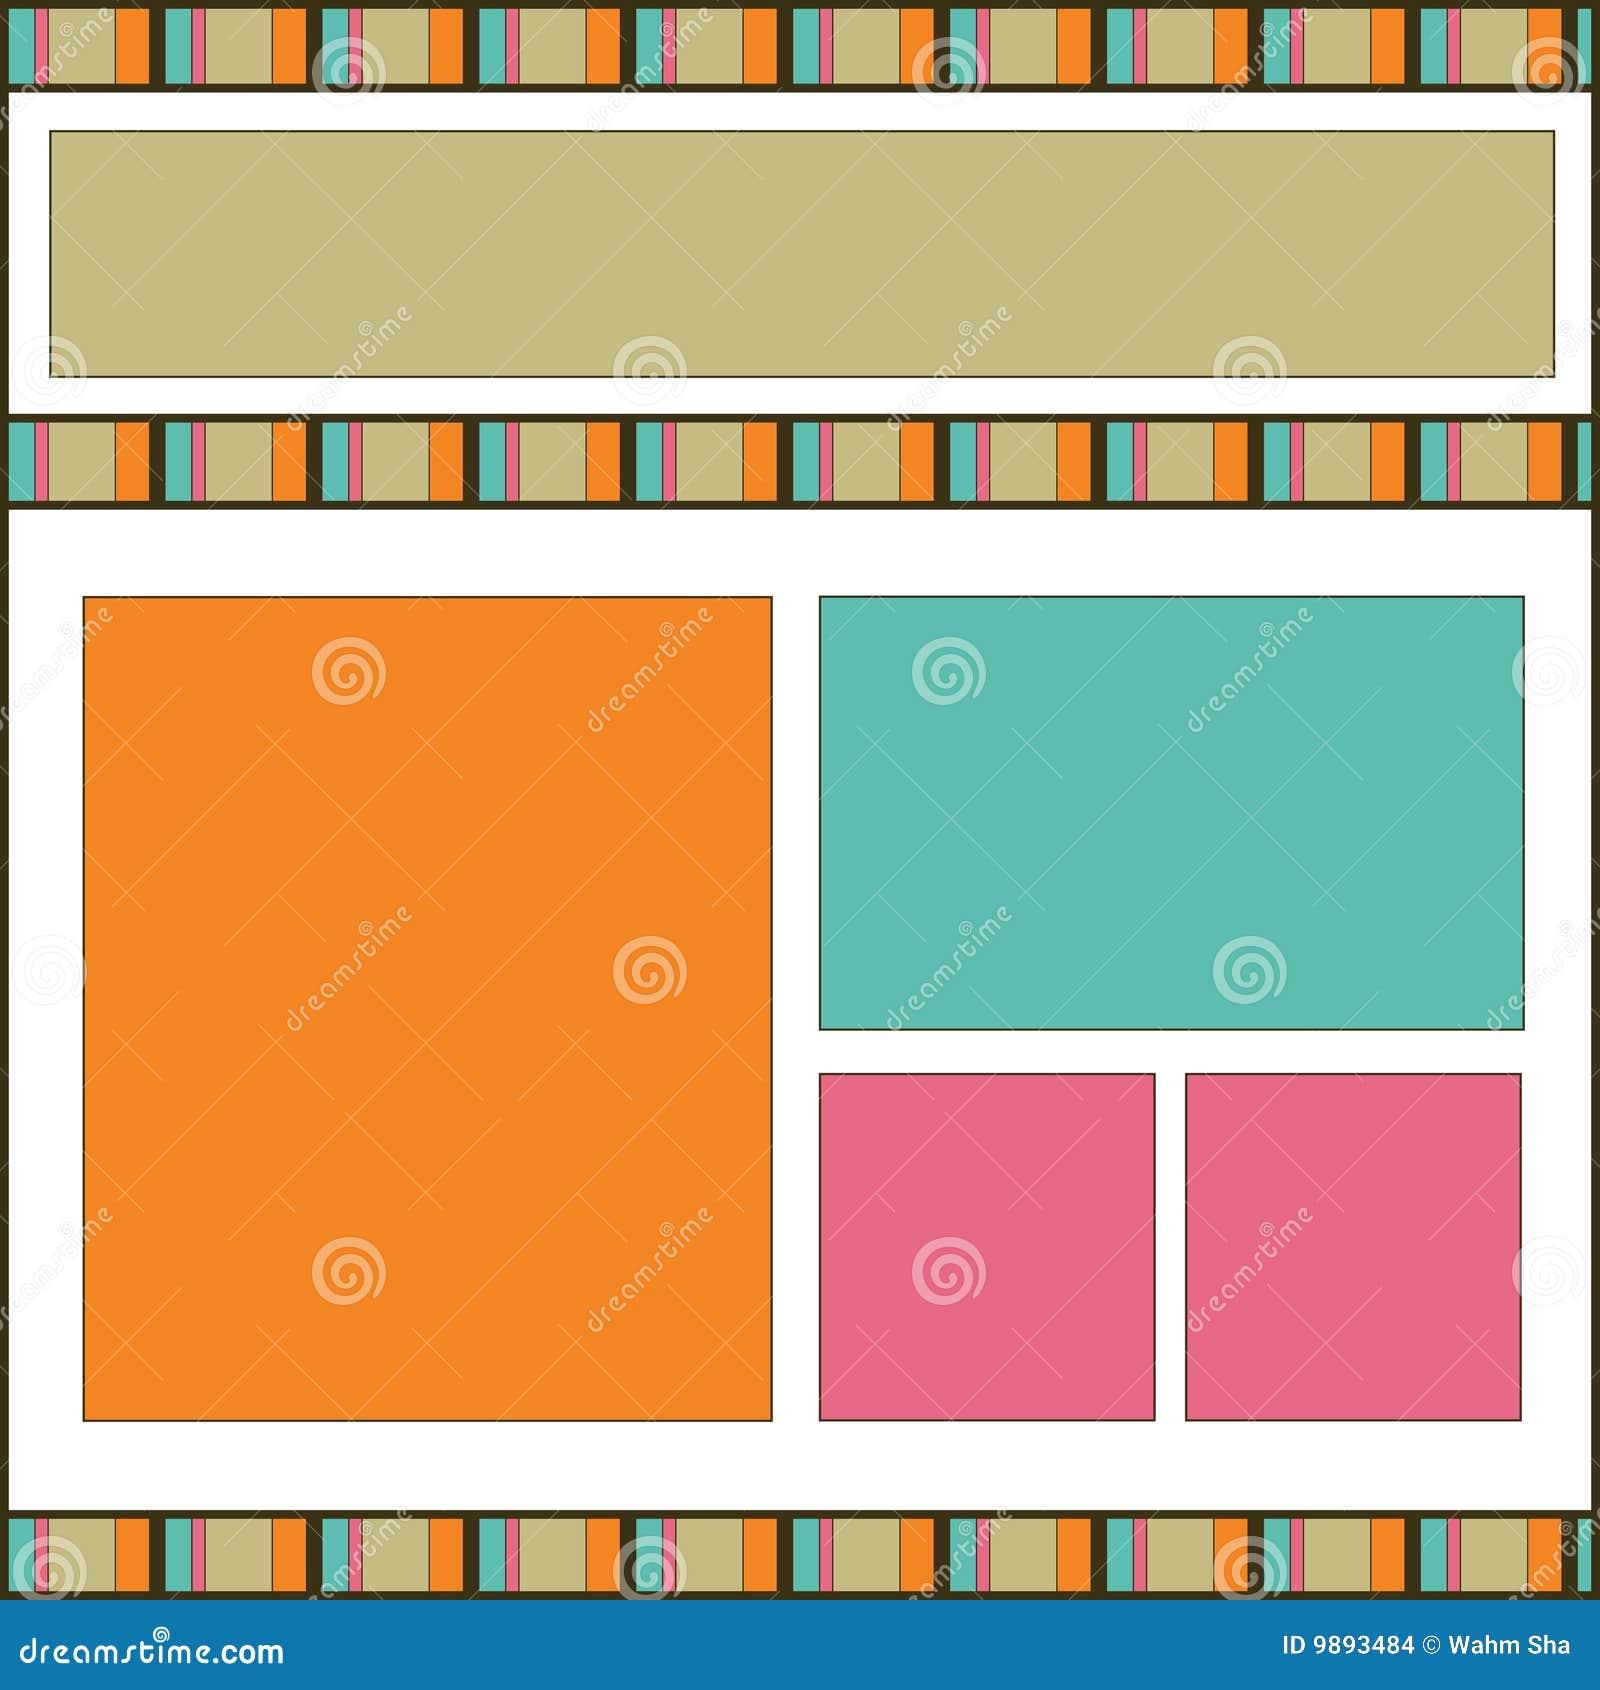 How to design scrapbook layouts - Modern Design Scrapbook Page